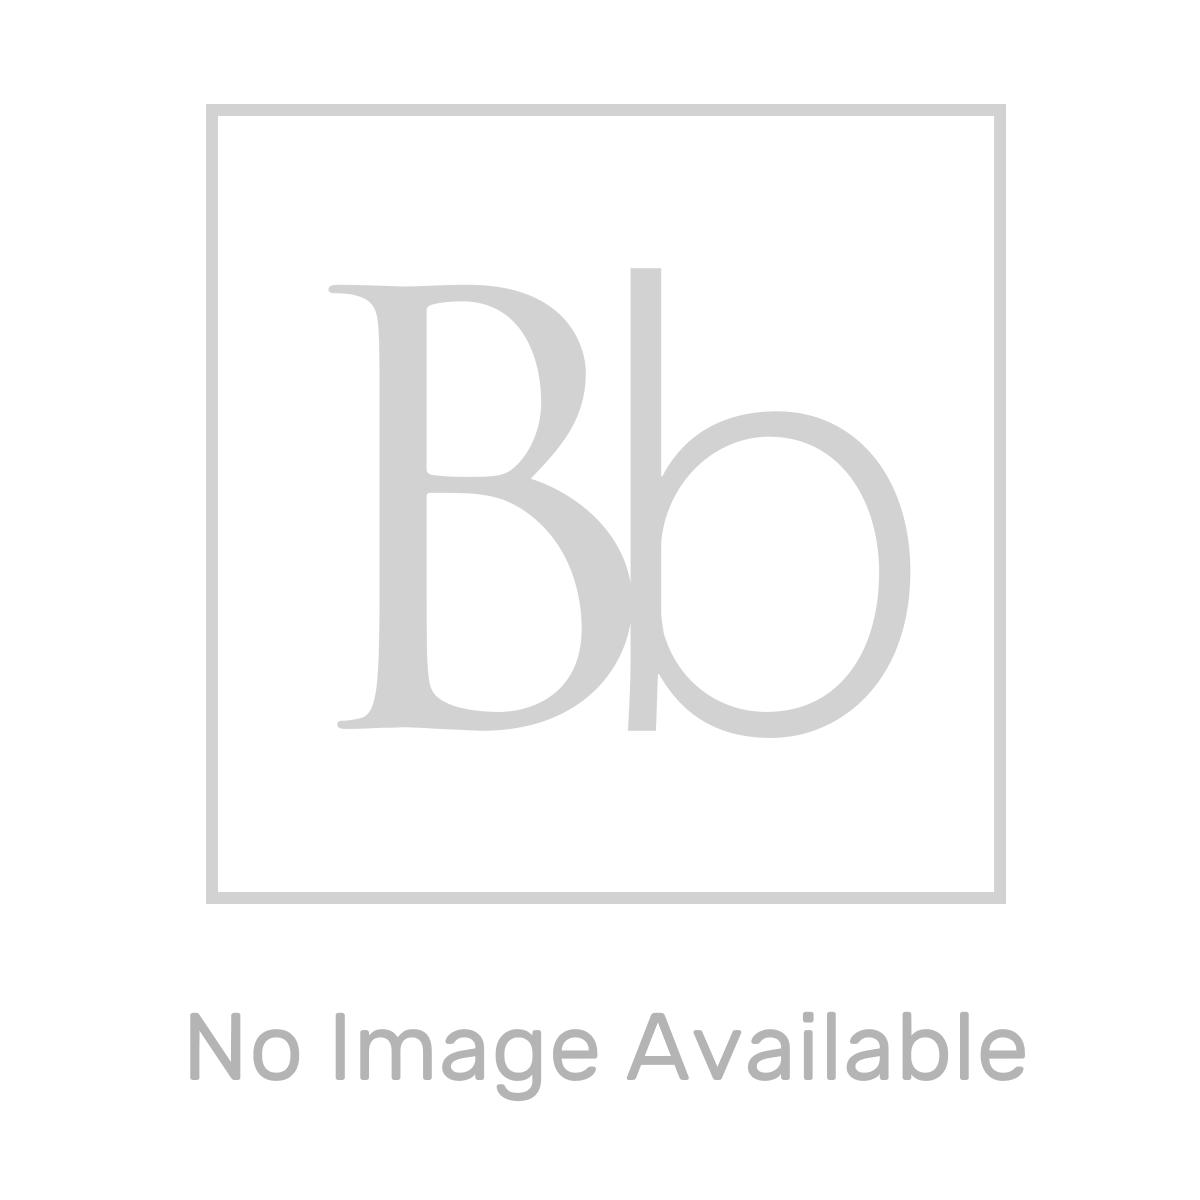 Croydex Ivory Woven Stripe Textile Shower Curtain